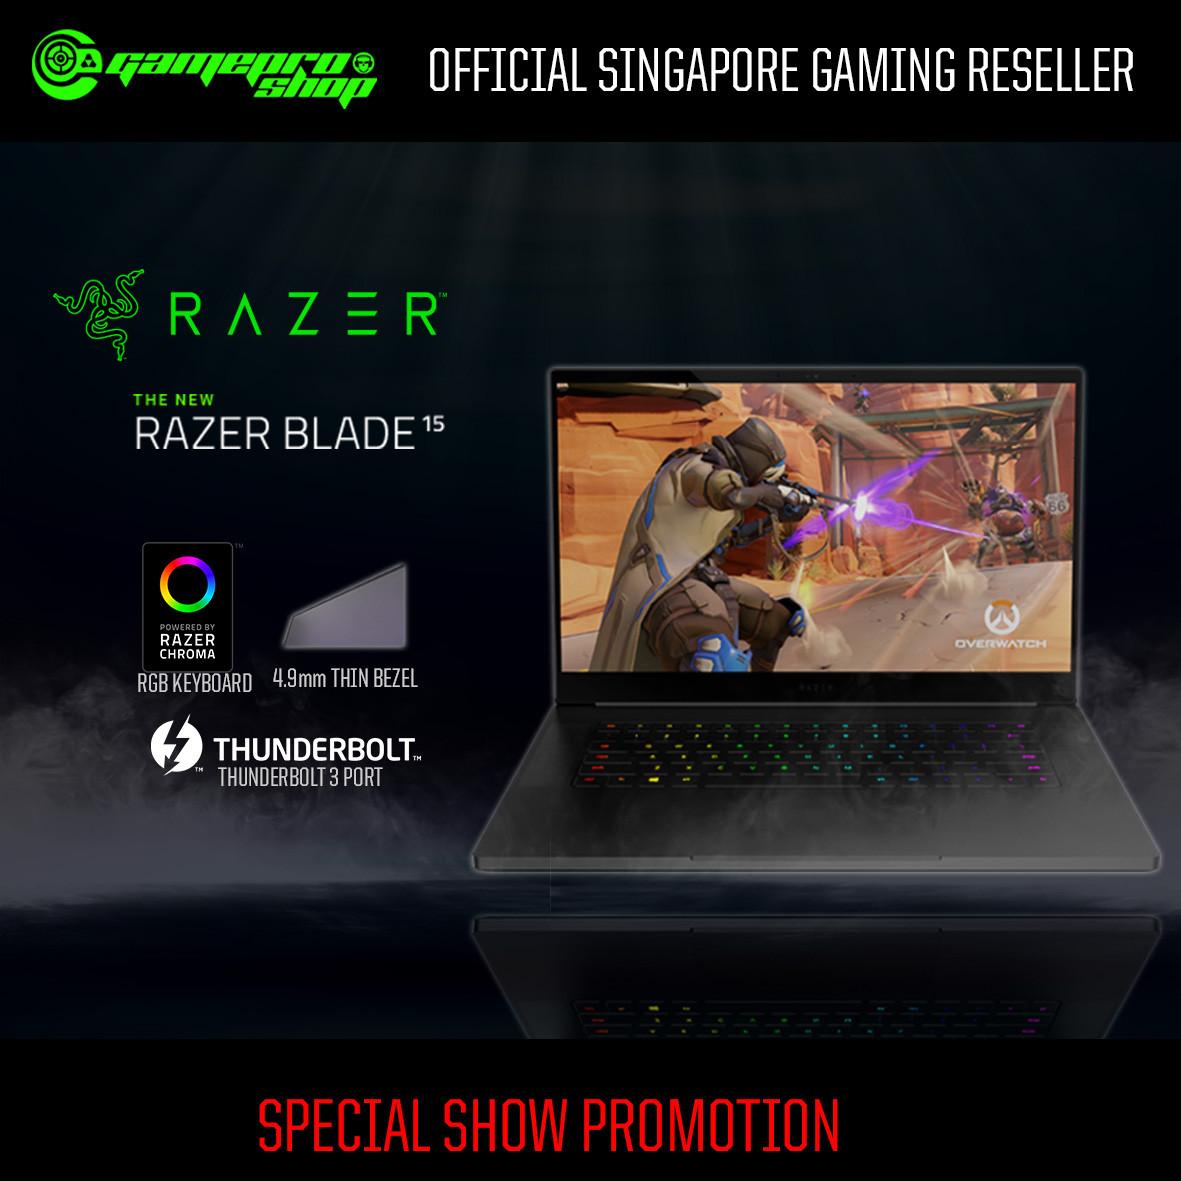 Razer Blade 15 Base Model (RZ09-02705E75-R341) (GTX 1060 6GB GDDR5)